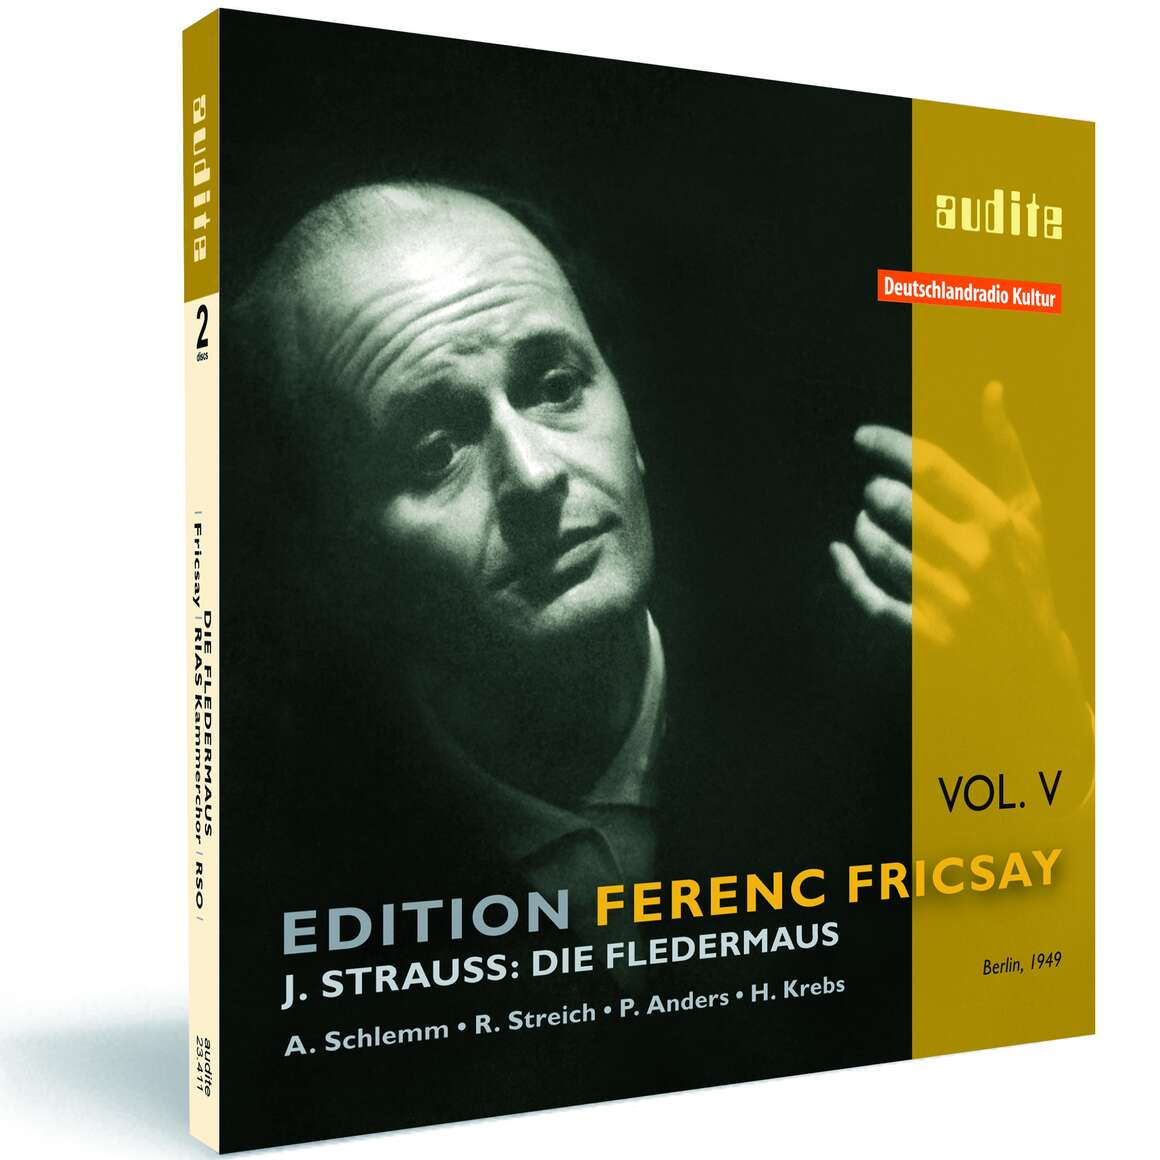 Edition Ferenc Fricsay (V) – J. Strauss: Die Fledermaus